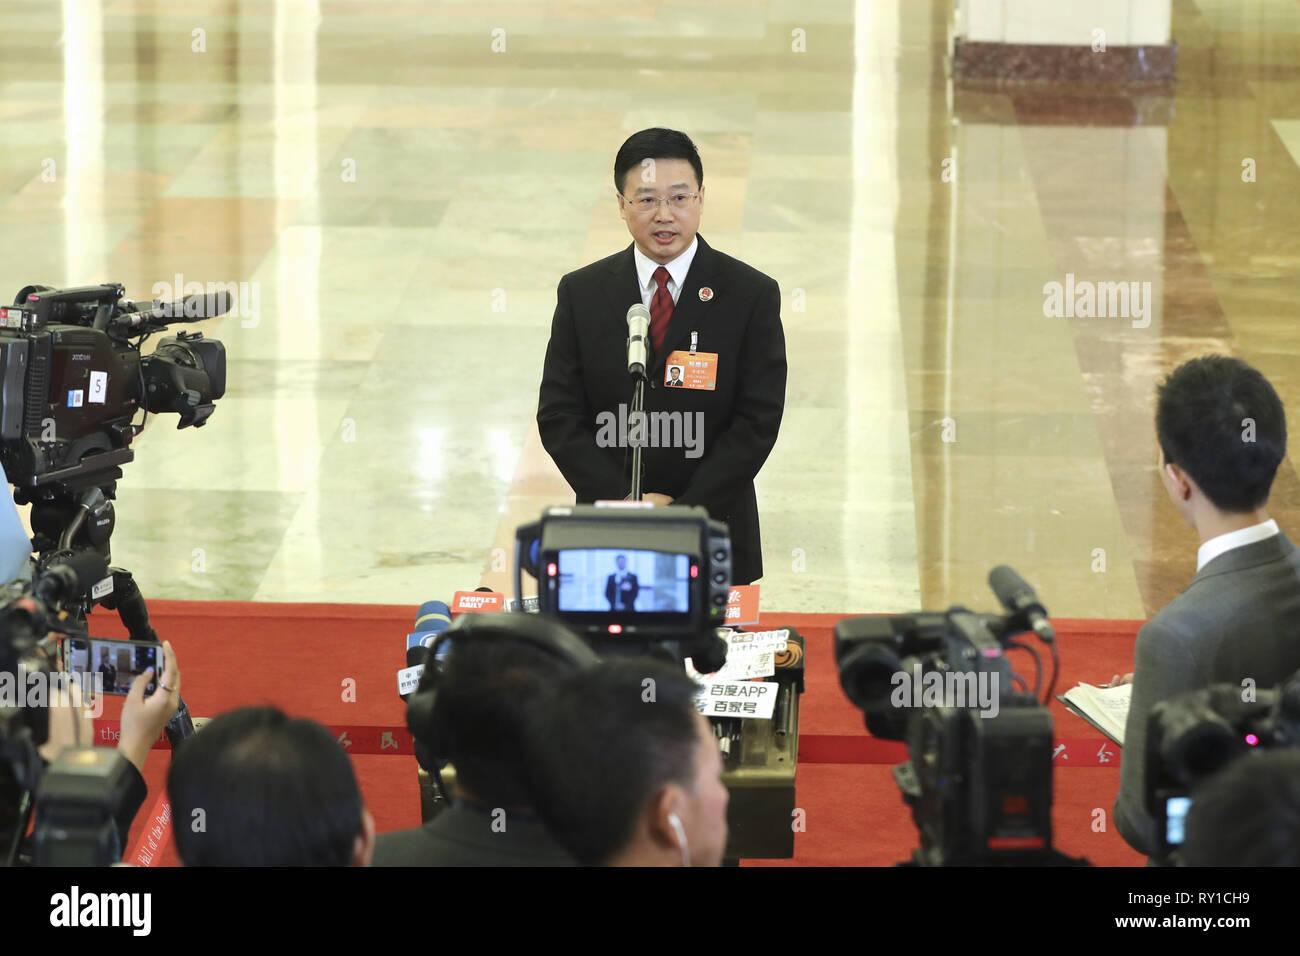 China To Combat Food, Drug, Crime